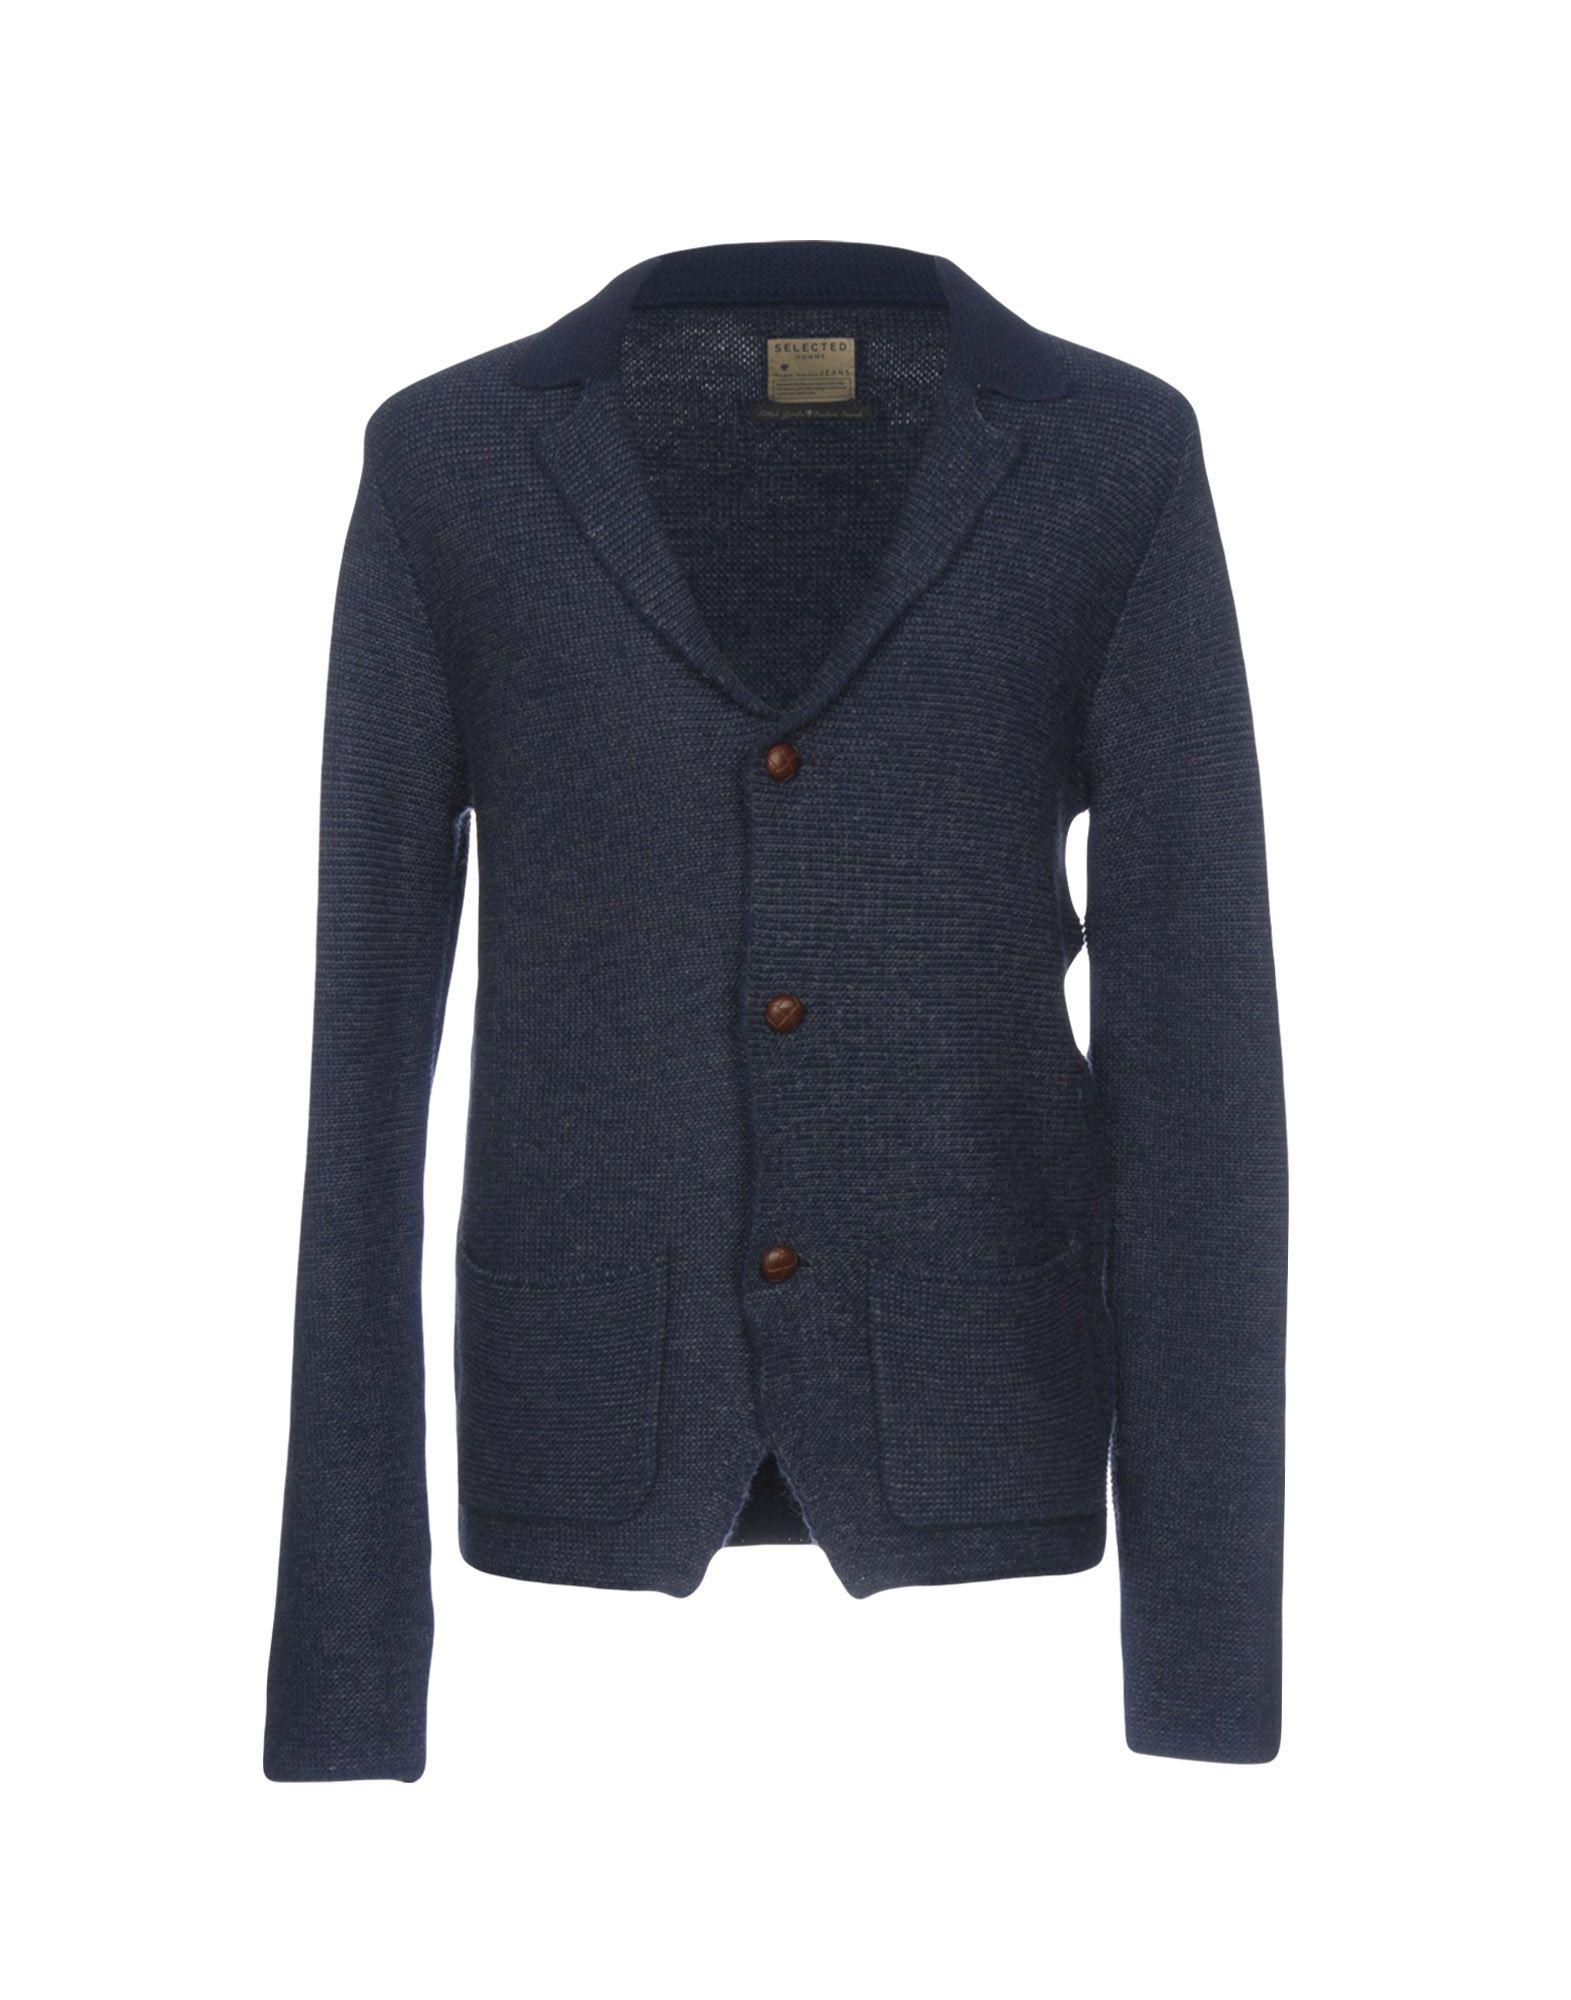 SELECTED HOMME Пиджак пиджак костюм selected 41515z001030 41515z001